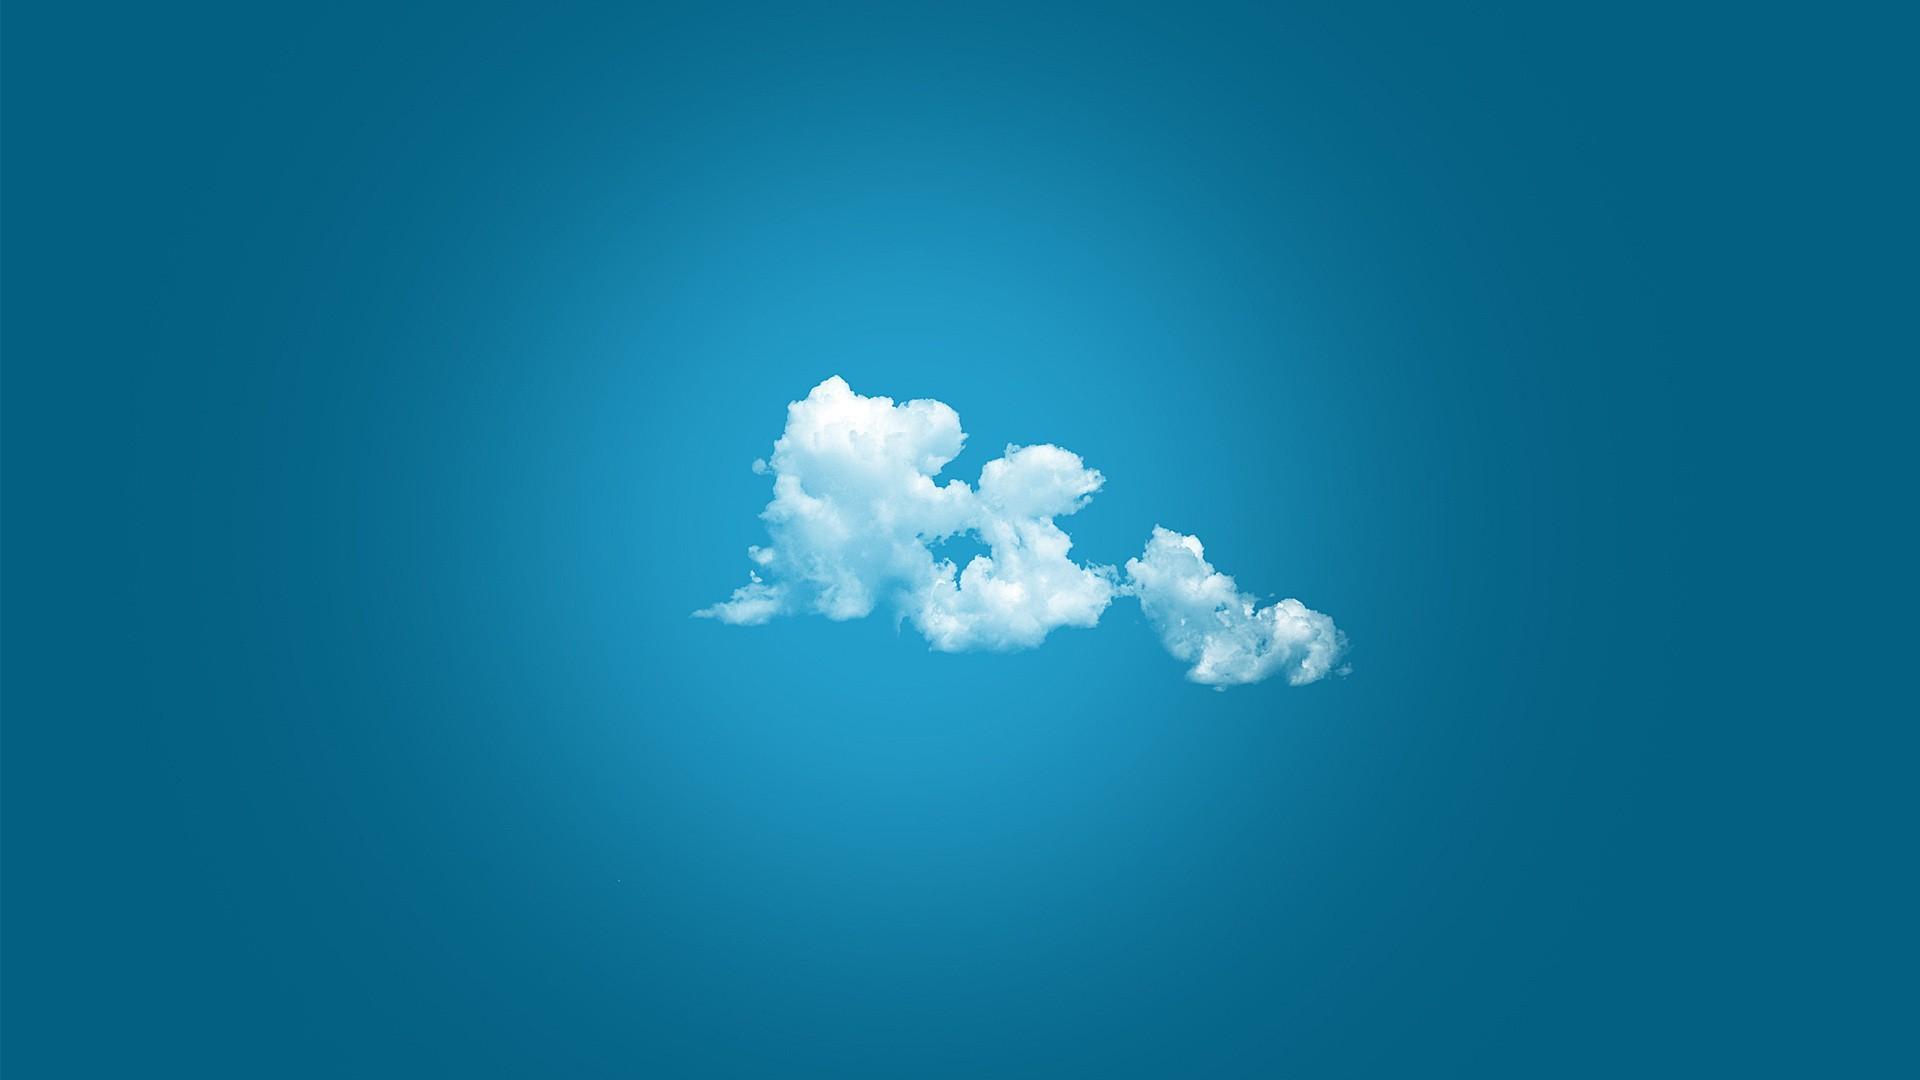 Creative cloud photography 2 computers